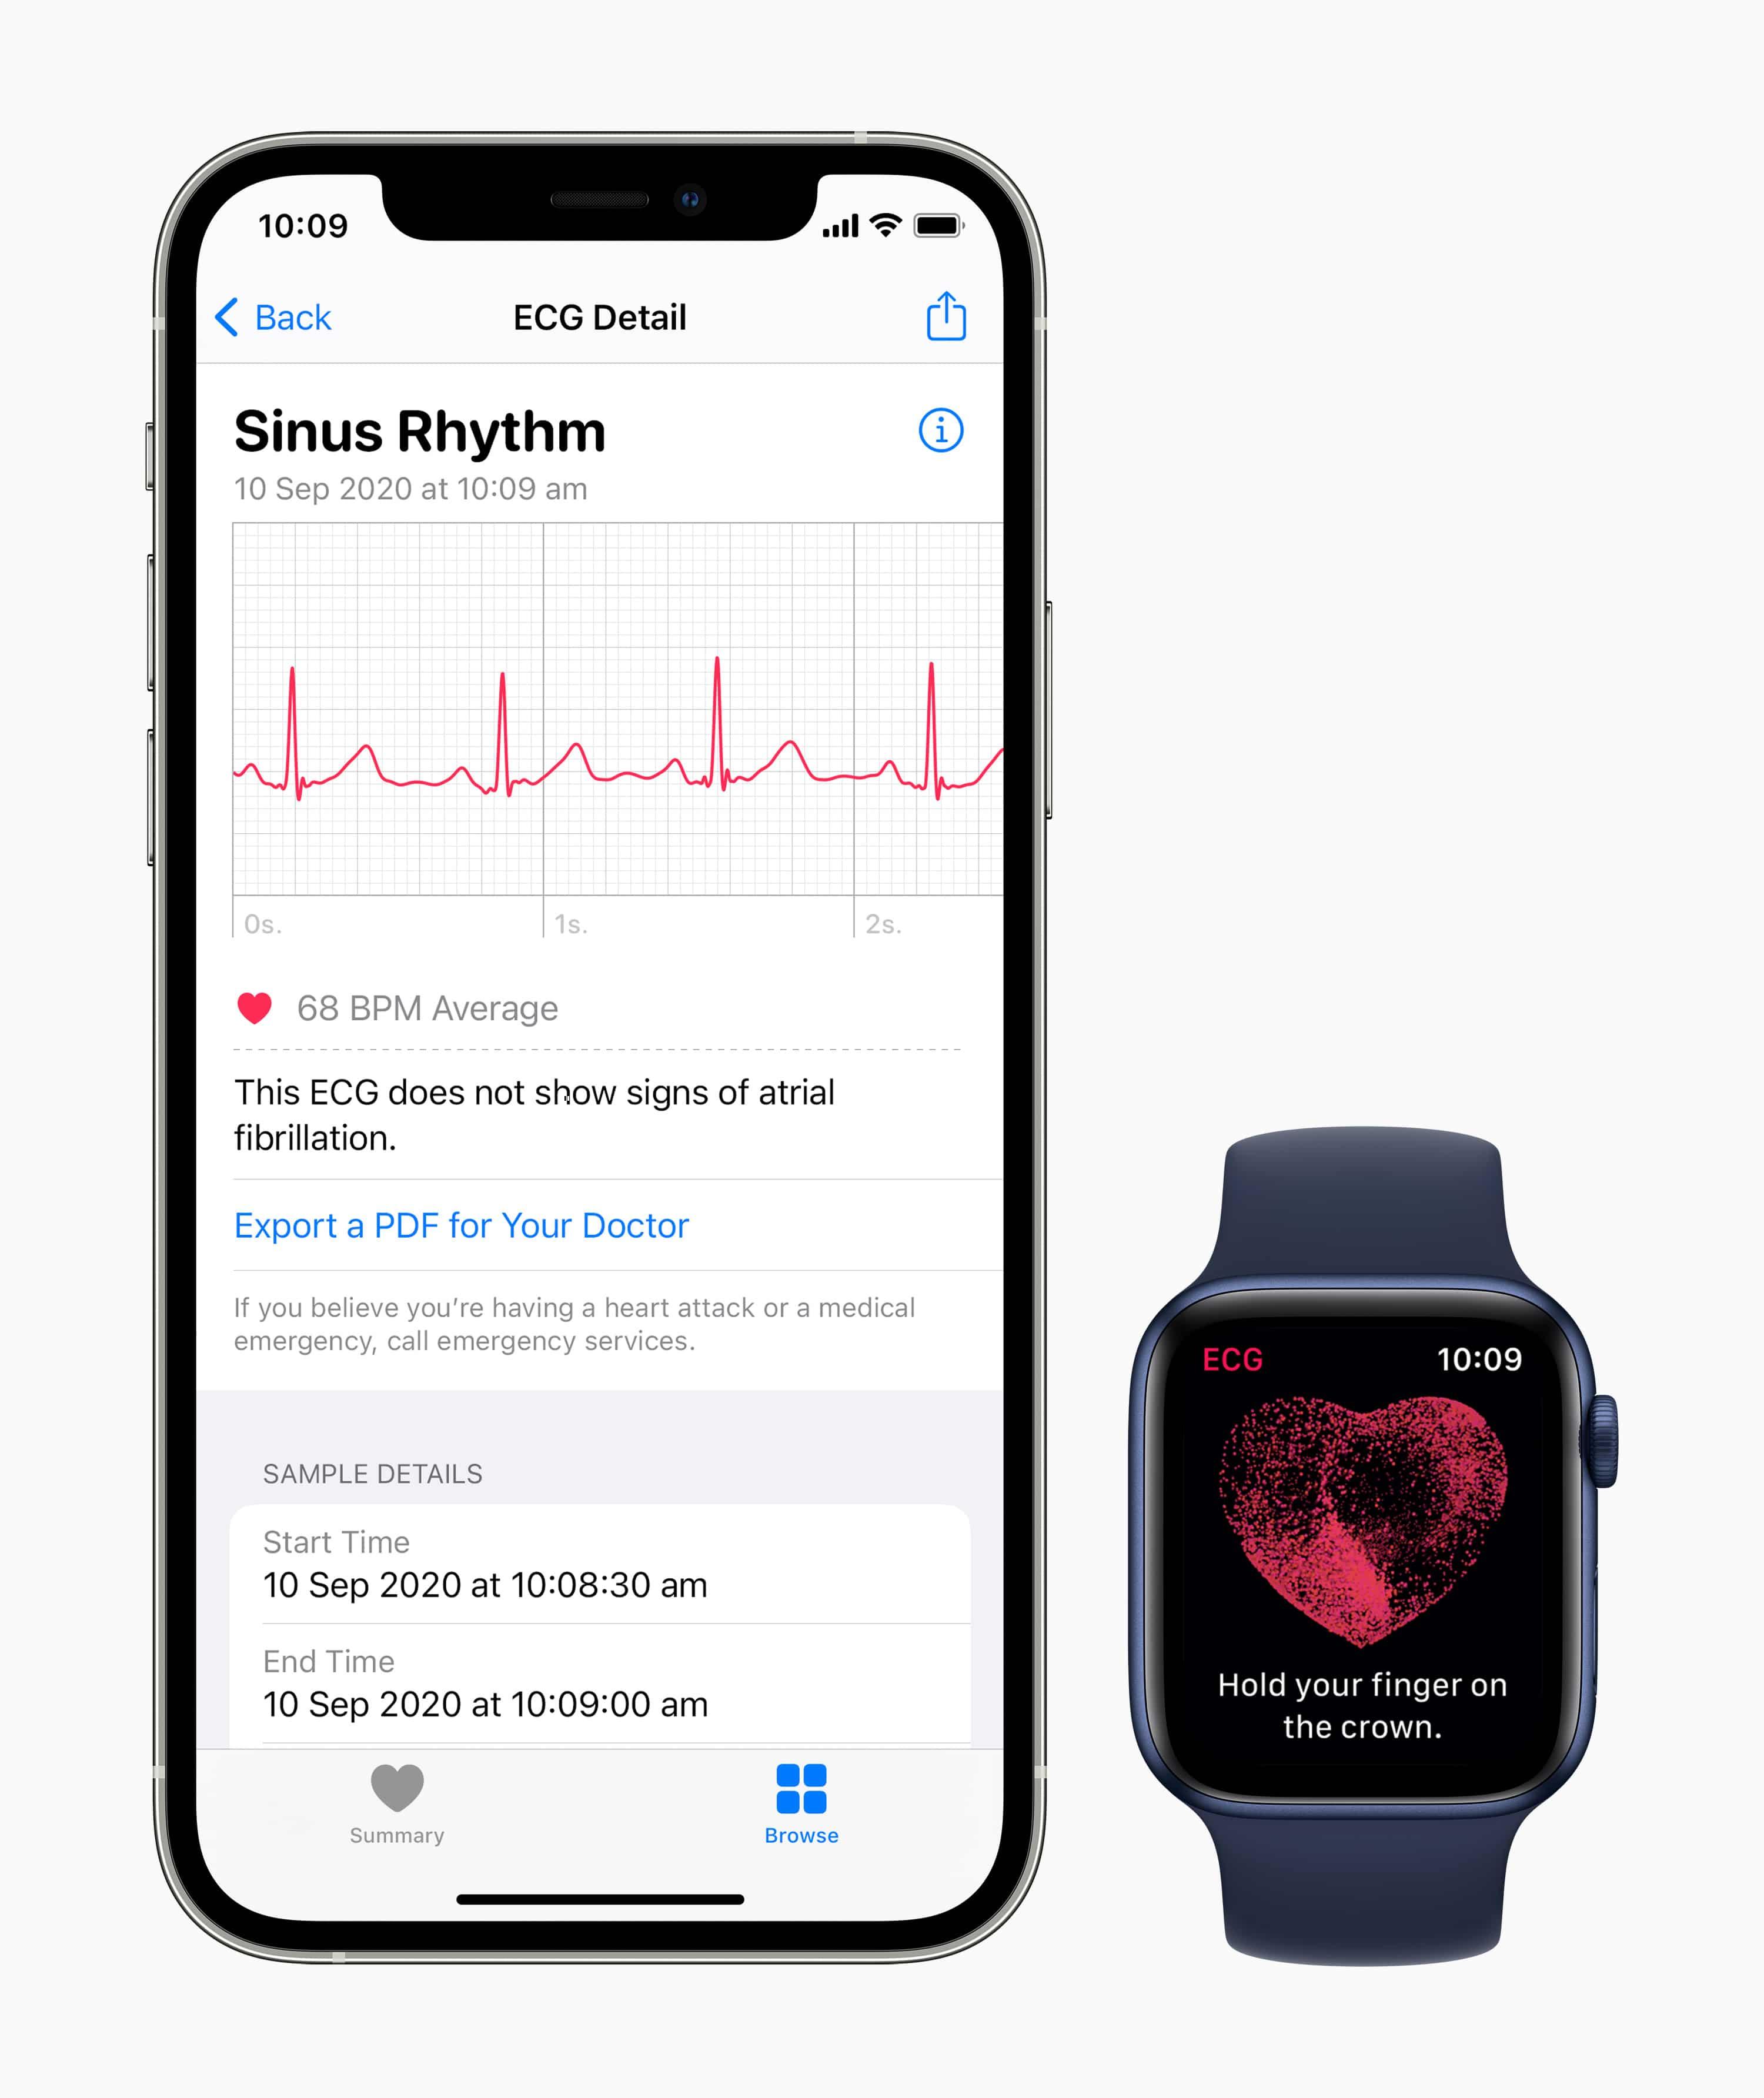 Dados do ECG no iPhone